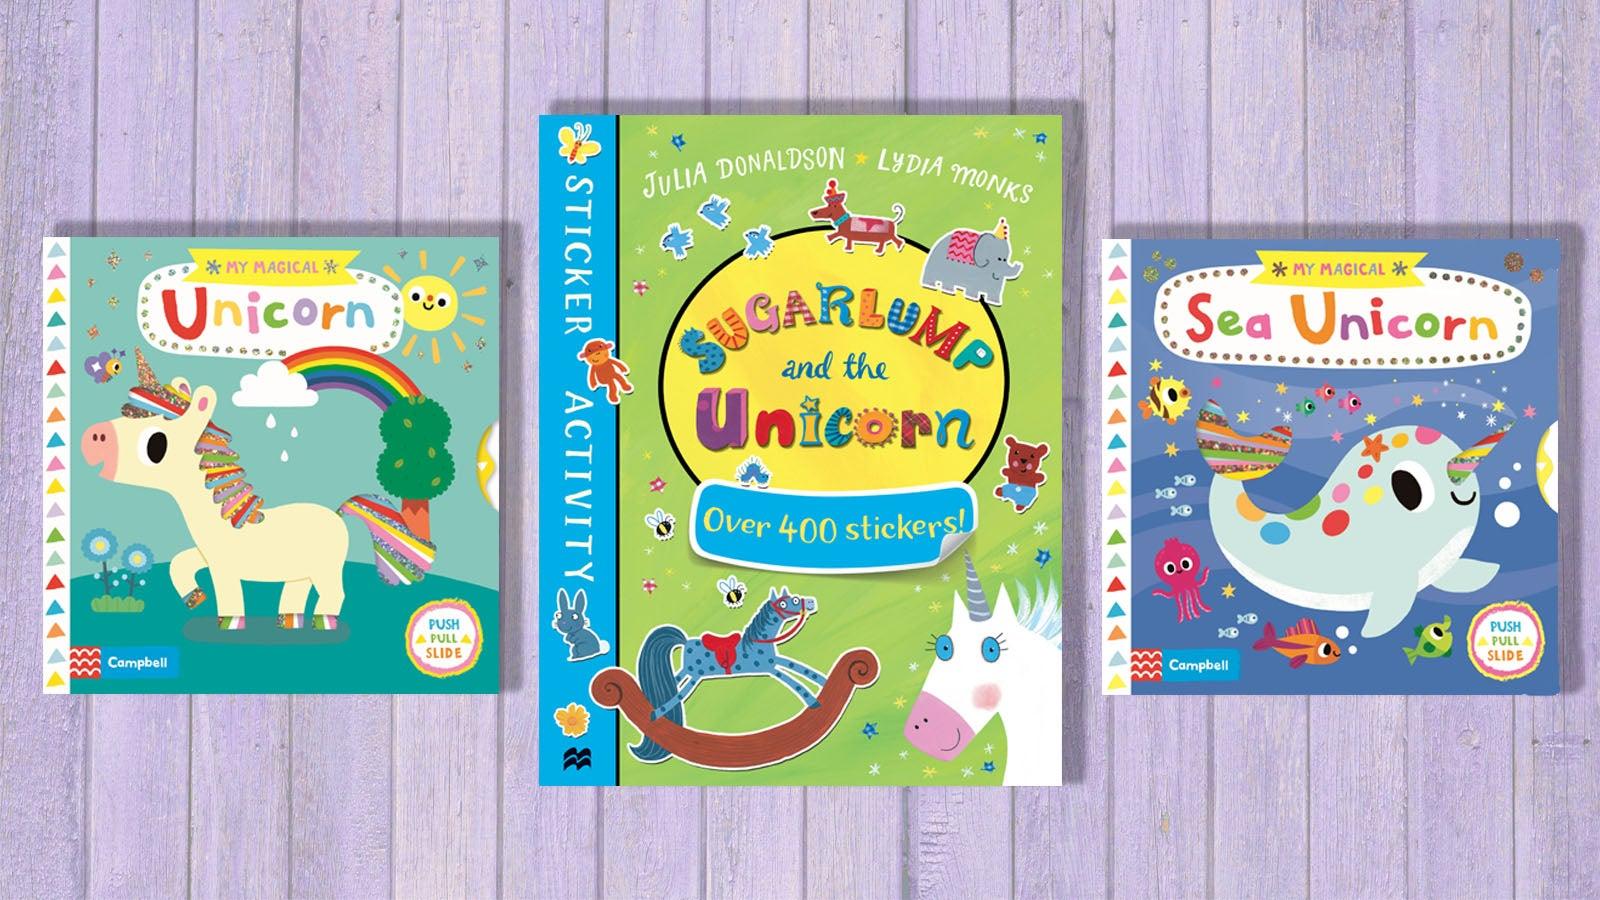 Children's books about unicorns